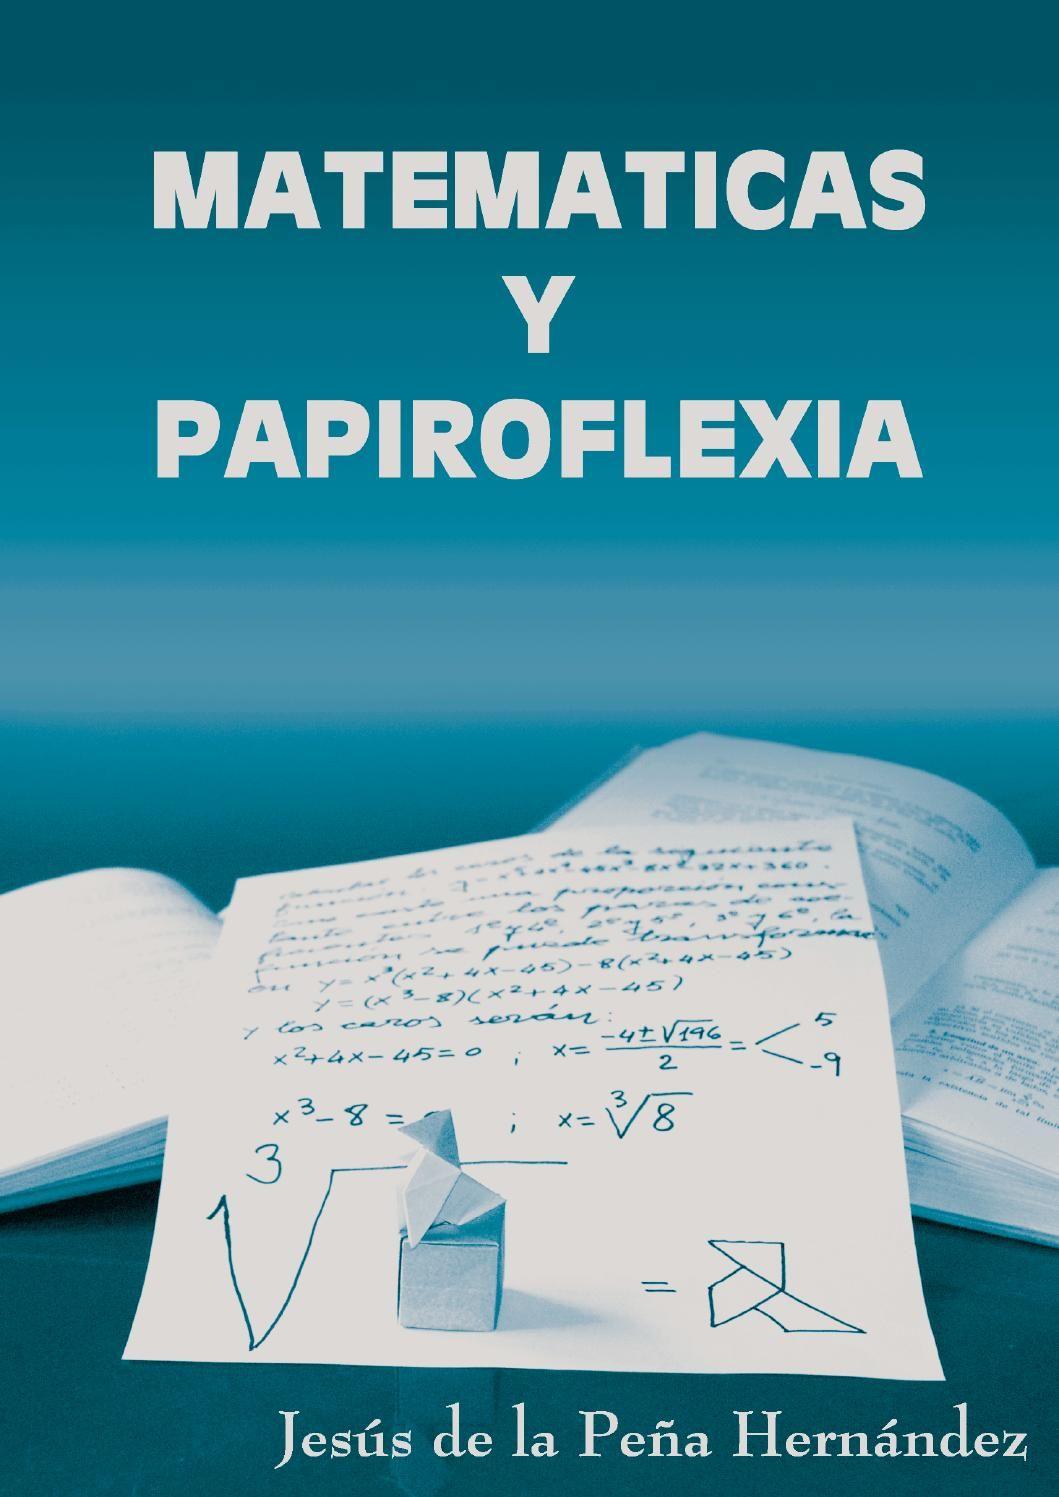 Matematicas Y Origami Español Matematicas Secundaria Matematicas Curiosidades Matematicas